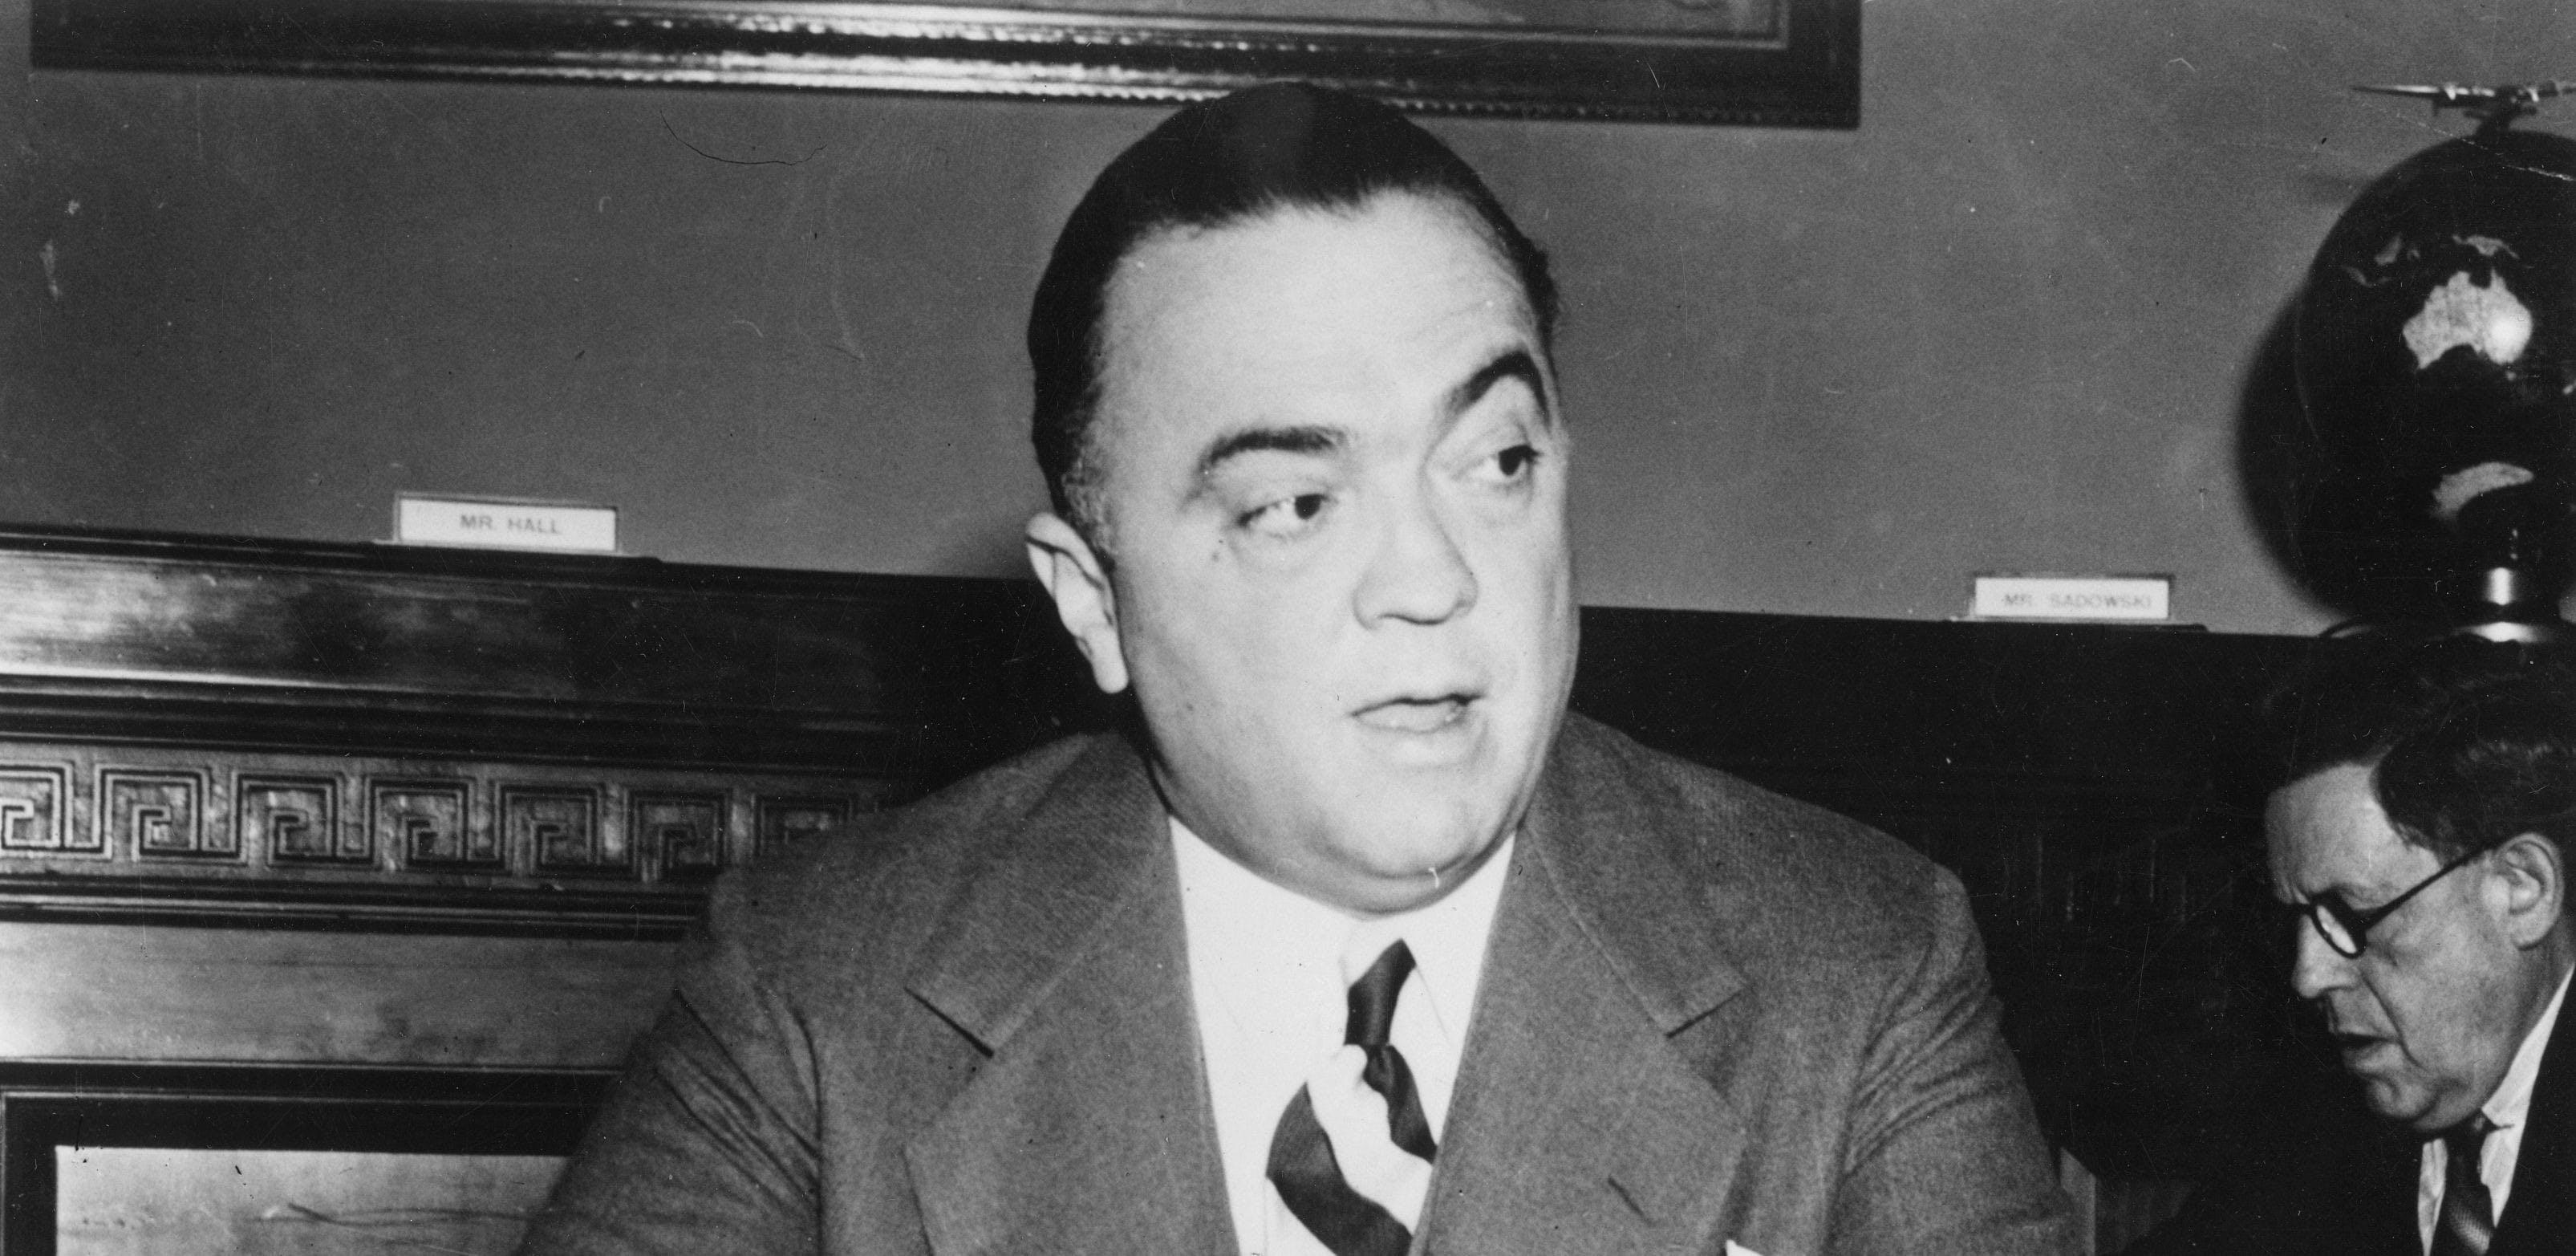 Senator Tells Funny J. Edgar Hoover Story to Warn Against Expanded FBI Surveillance Power